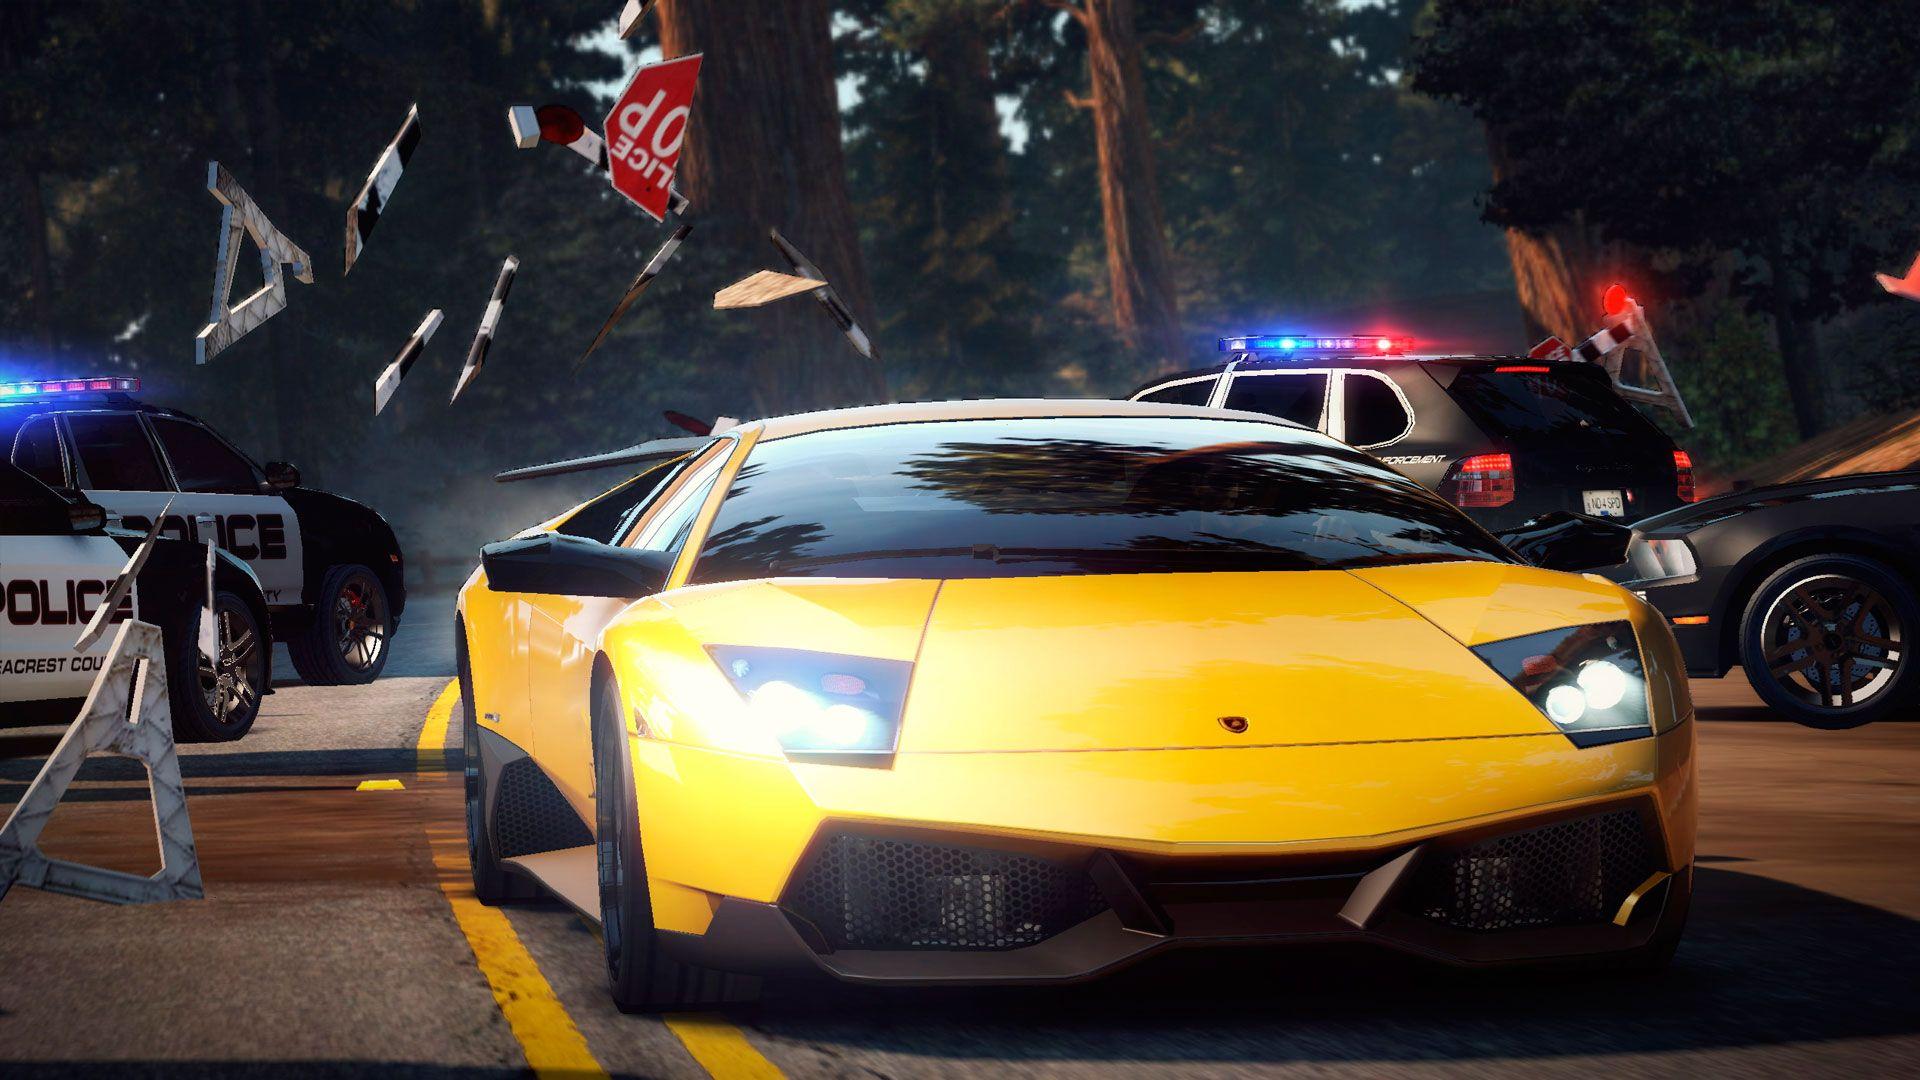 Lamborghini Car Hd Wallpaper Free Download Full Hd Backgrounds 1080p Cars Pixelstalk Net